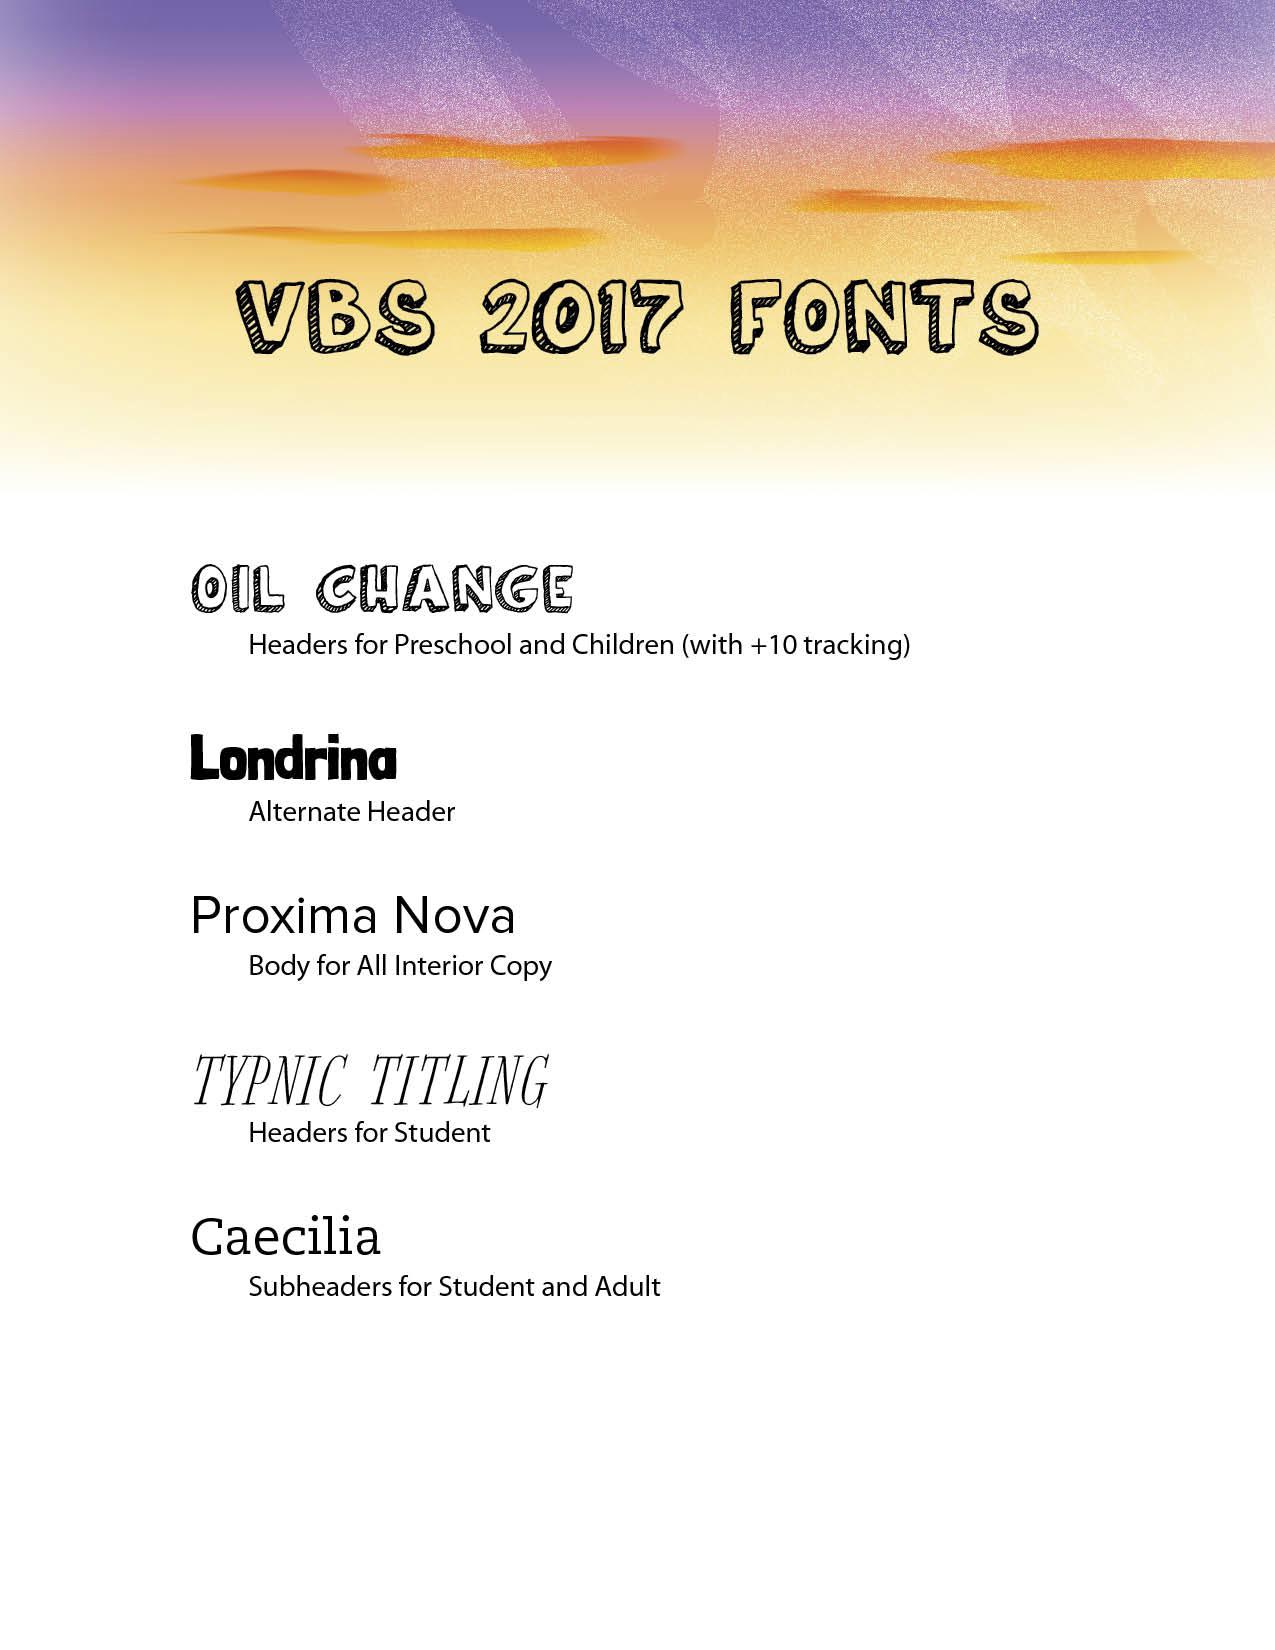 galactic starveyor fonts lifeway vbs